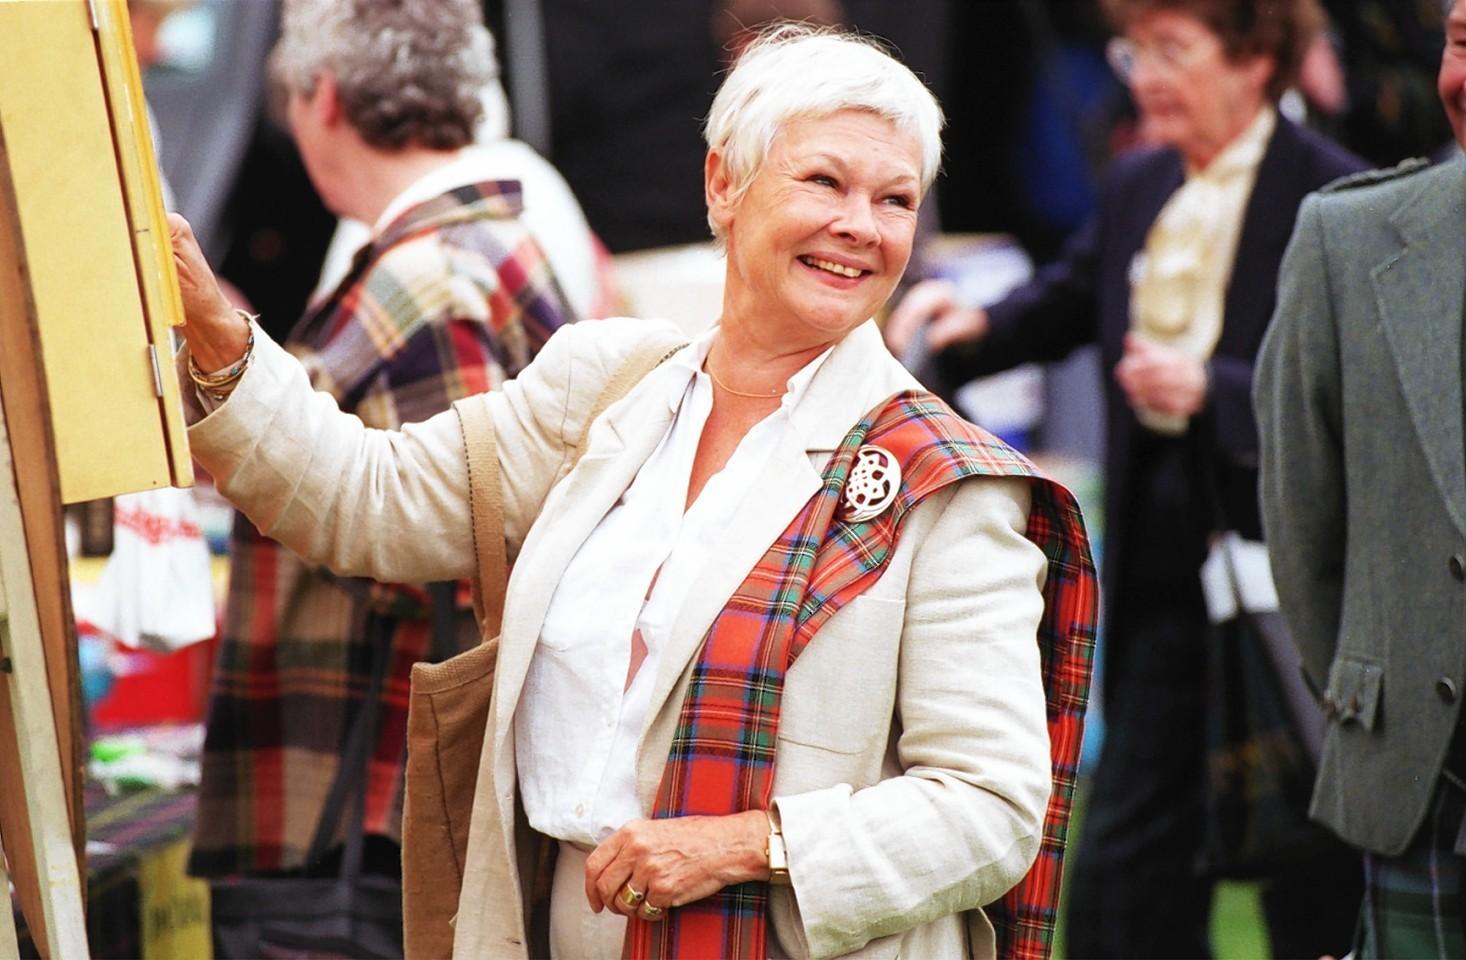 Dame Judi Dench at the Lonach Gathering